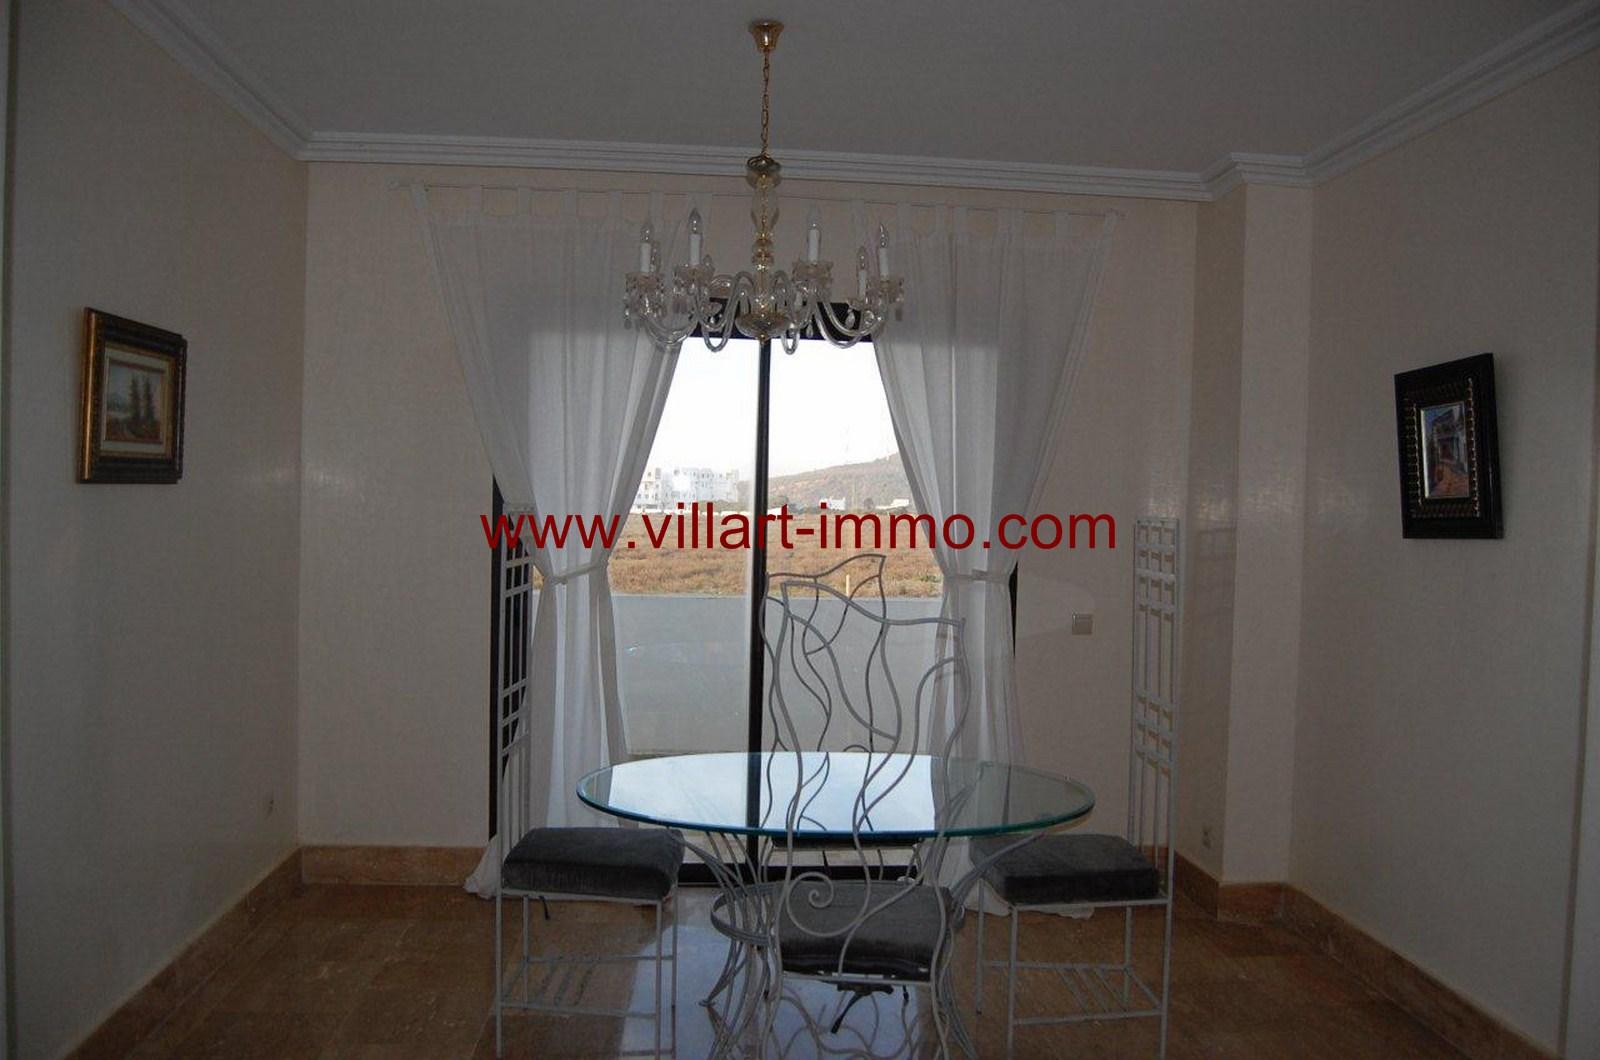 2-vente-appartement-tanger-achakar-sejour-va391-villart-immo